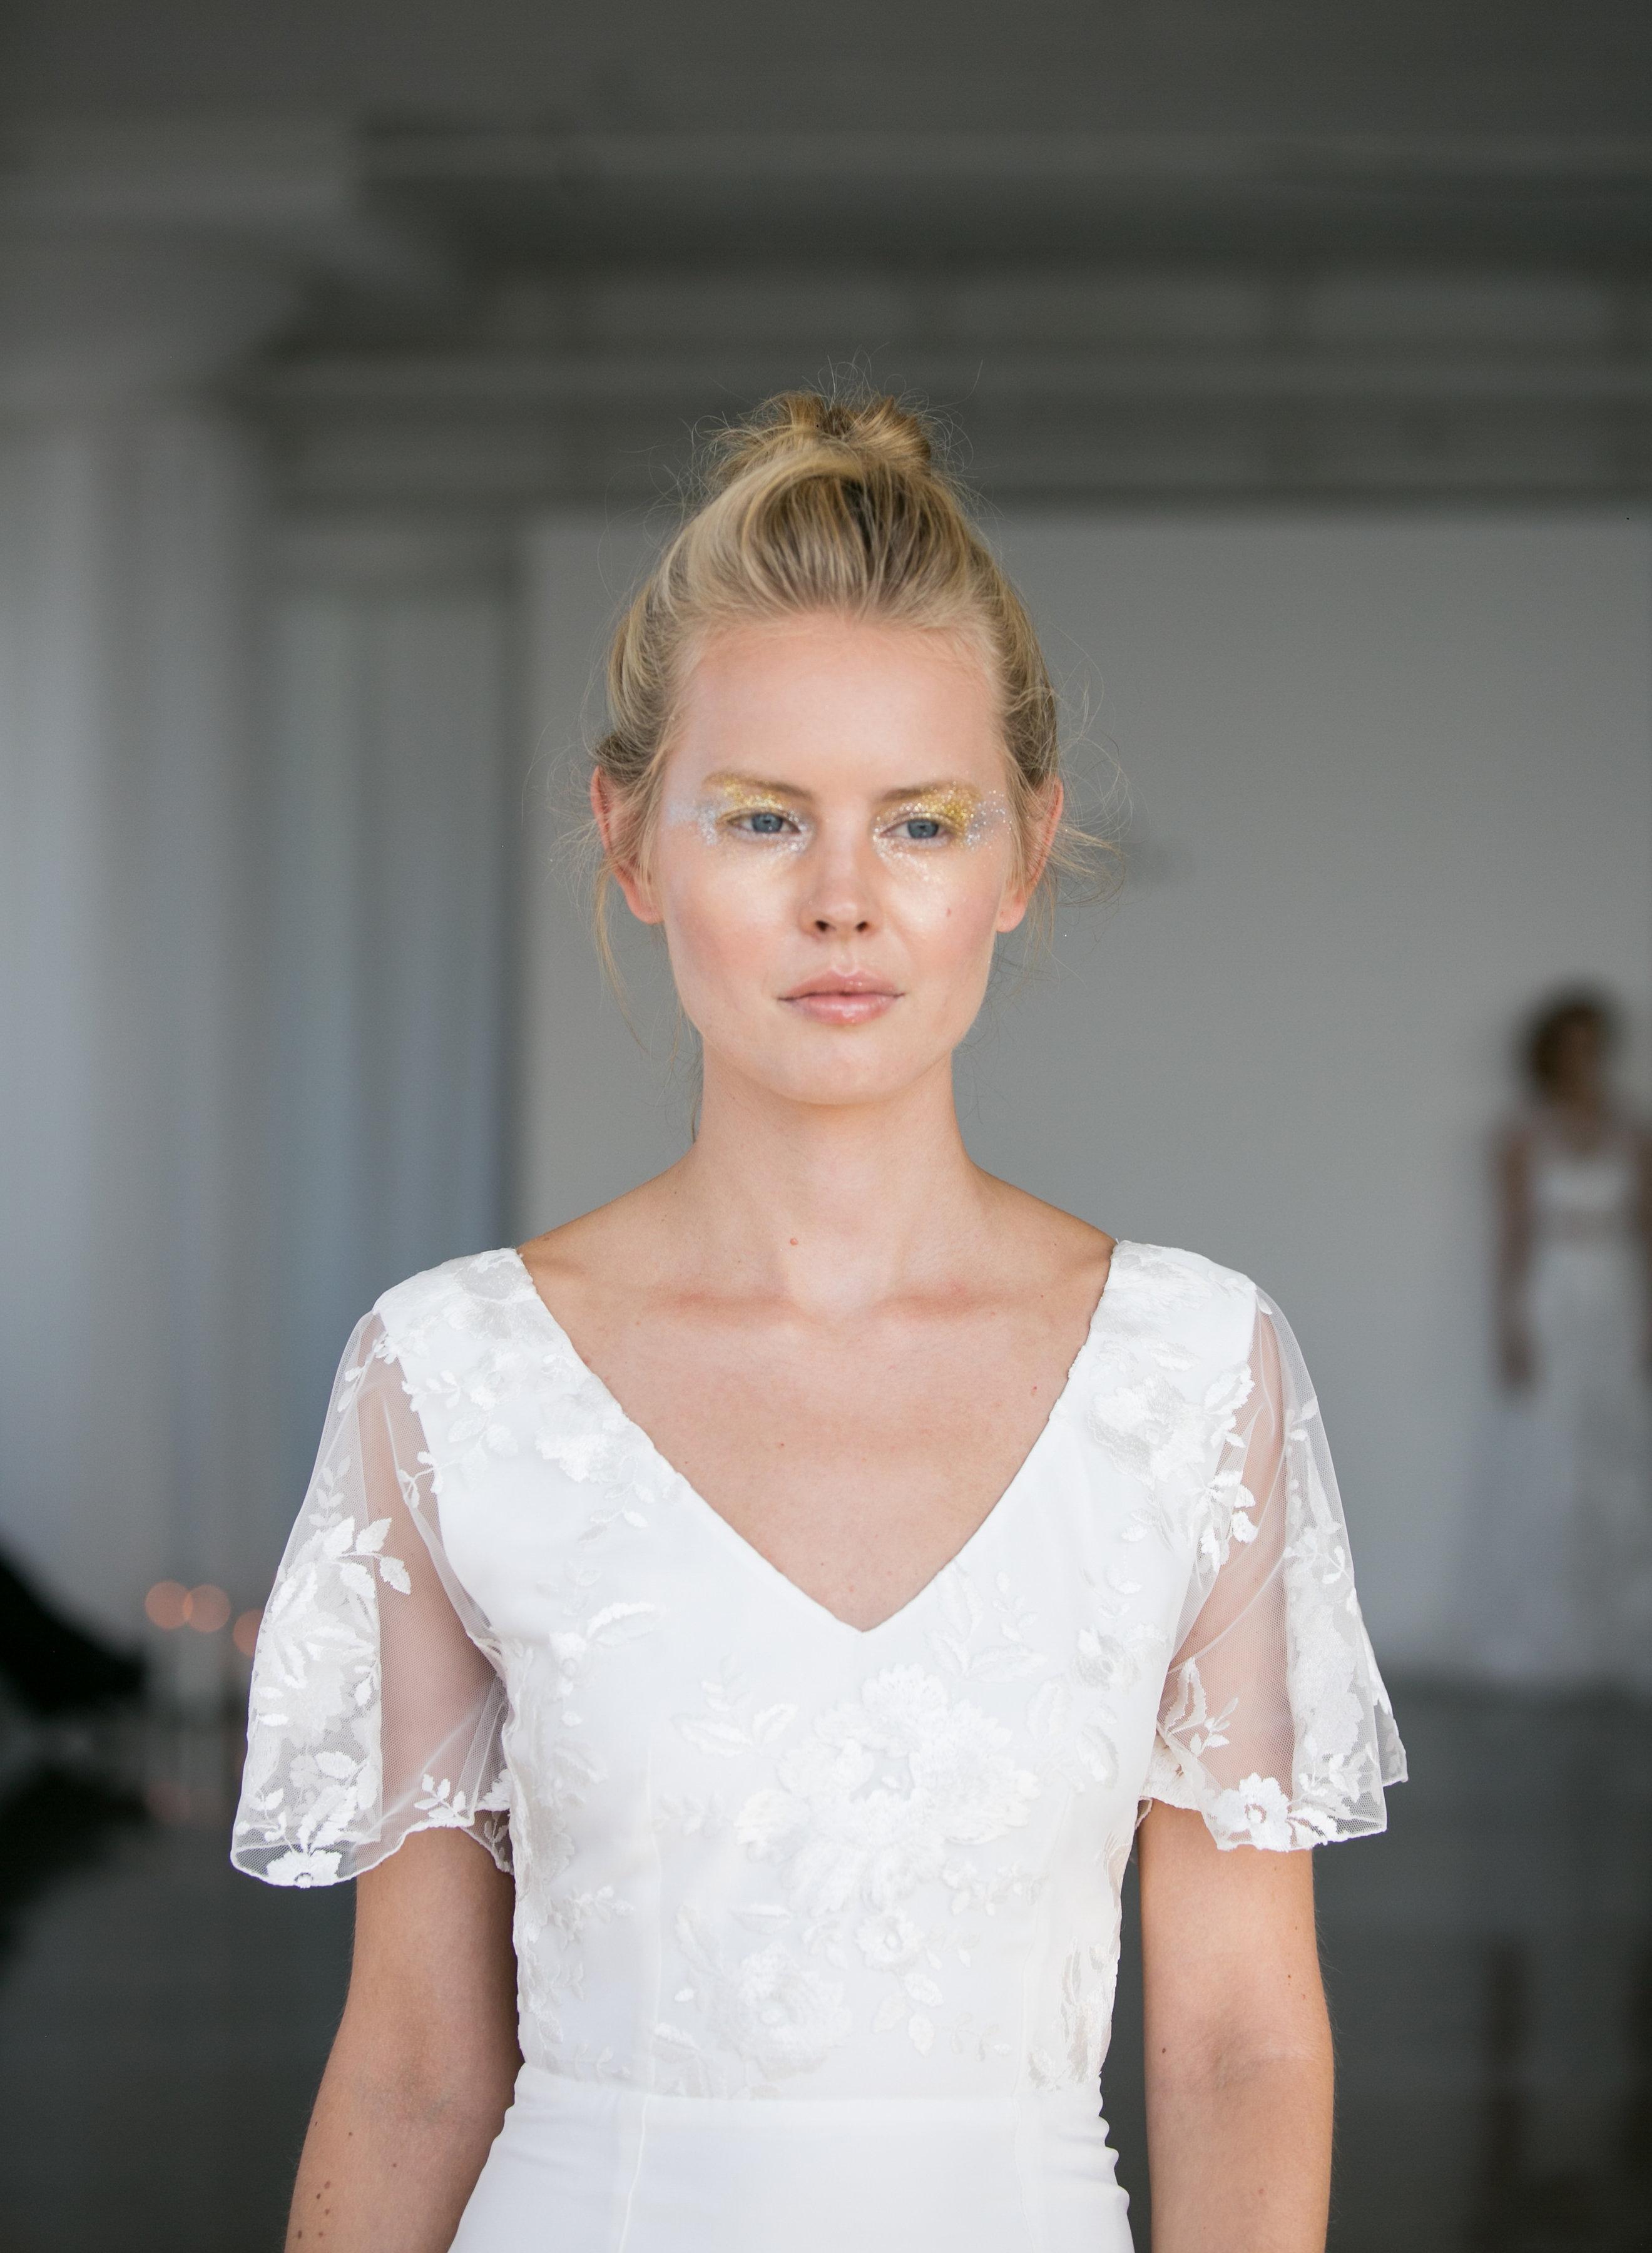 rime-arodaky-fall-2017-wedding-hairstyle-look-2-front-1016